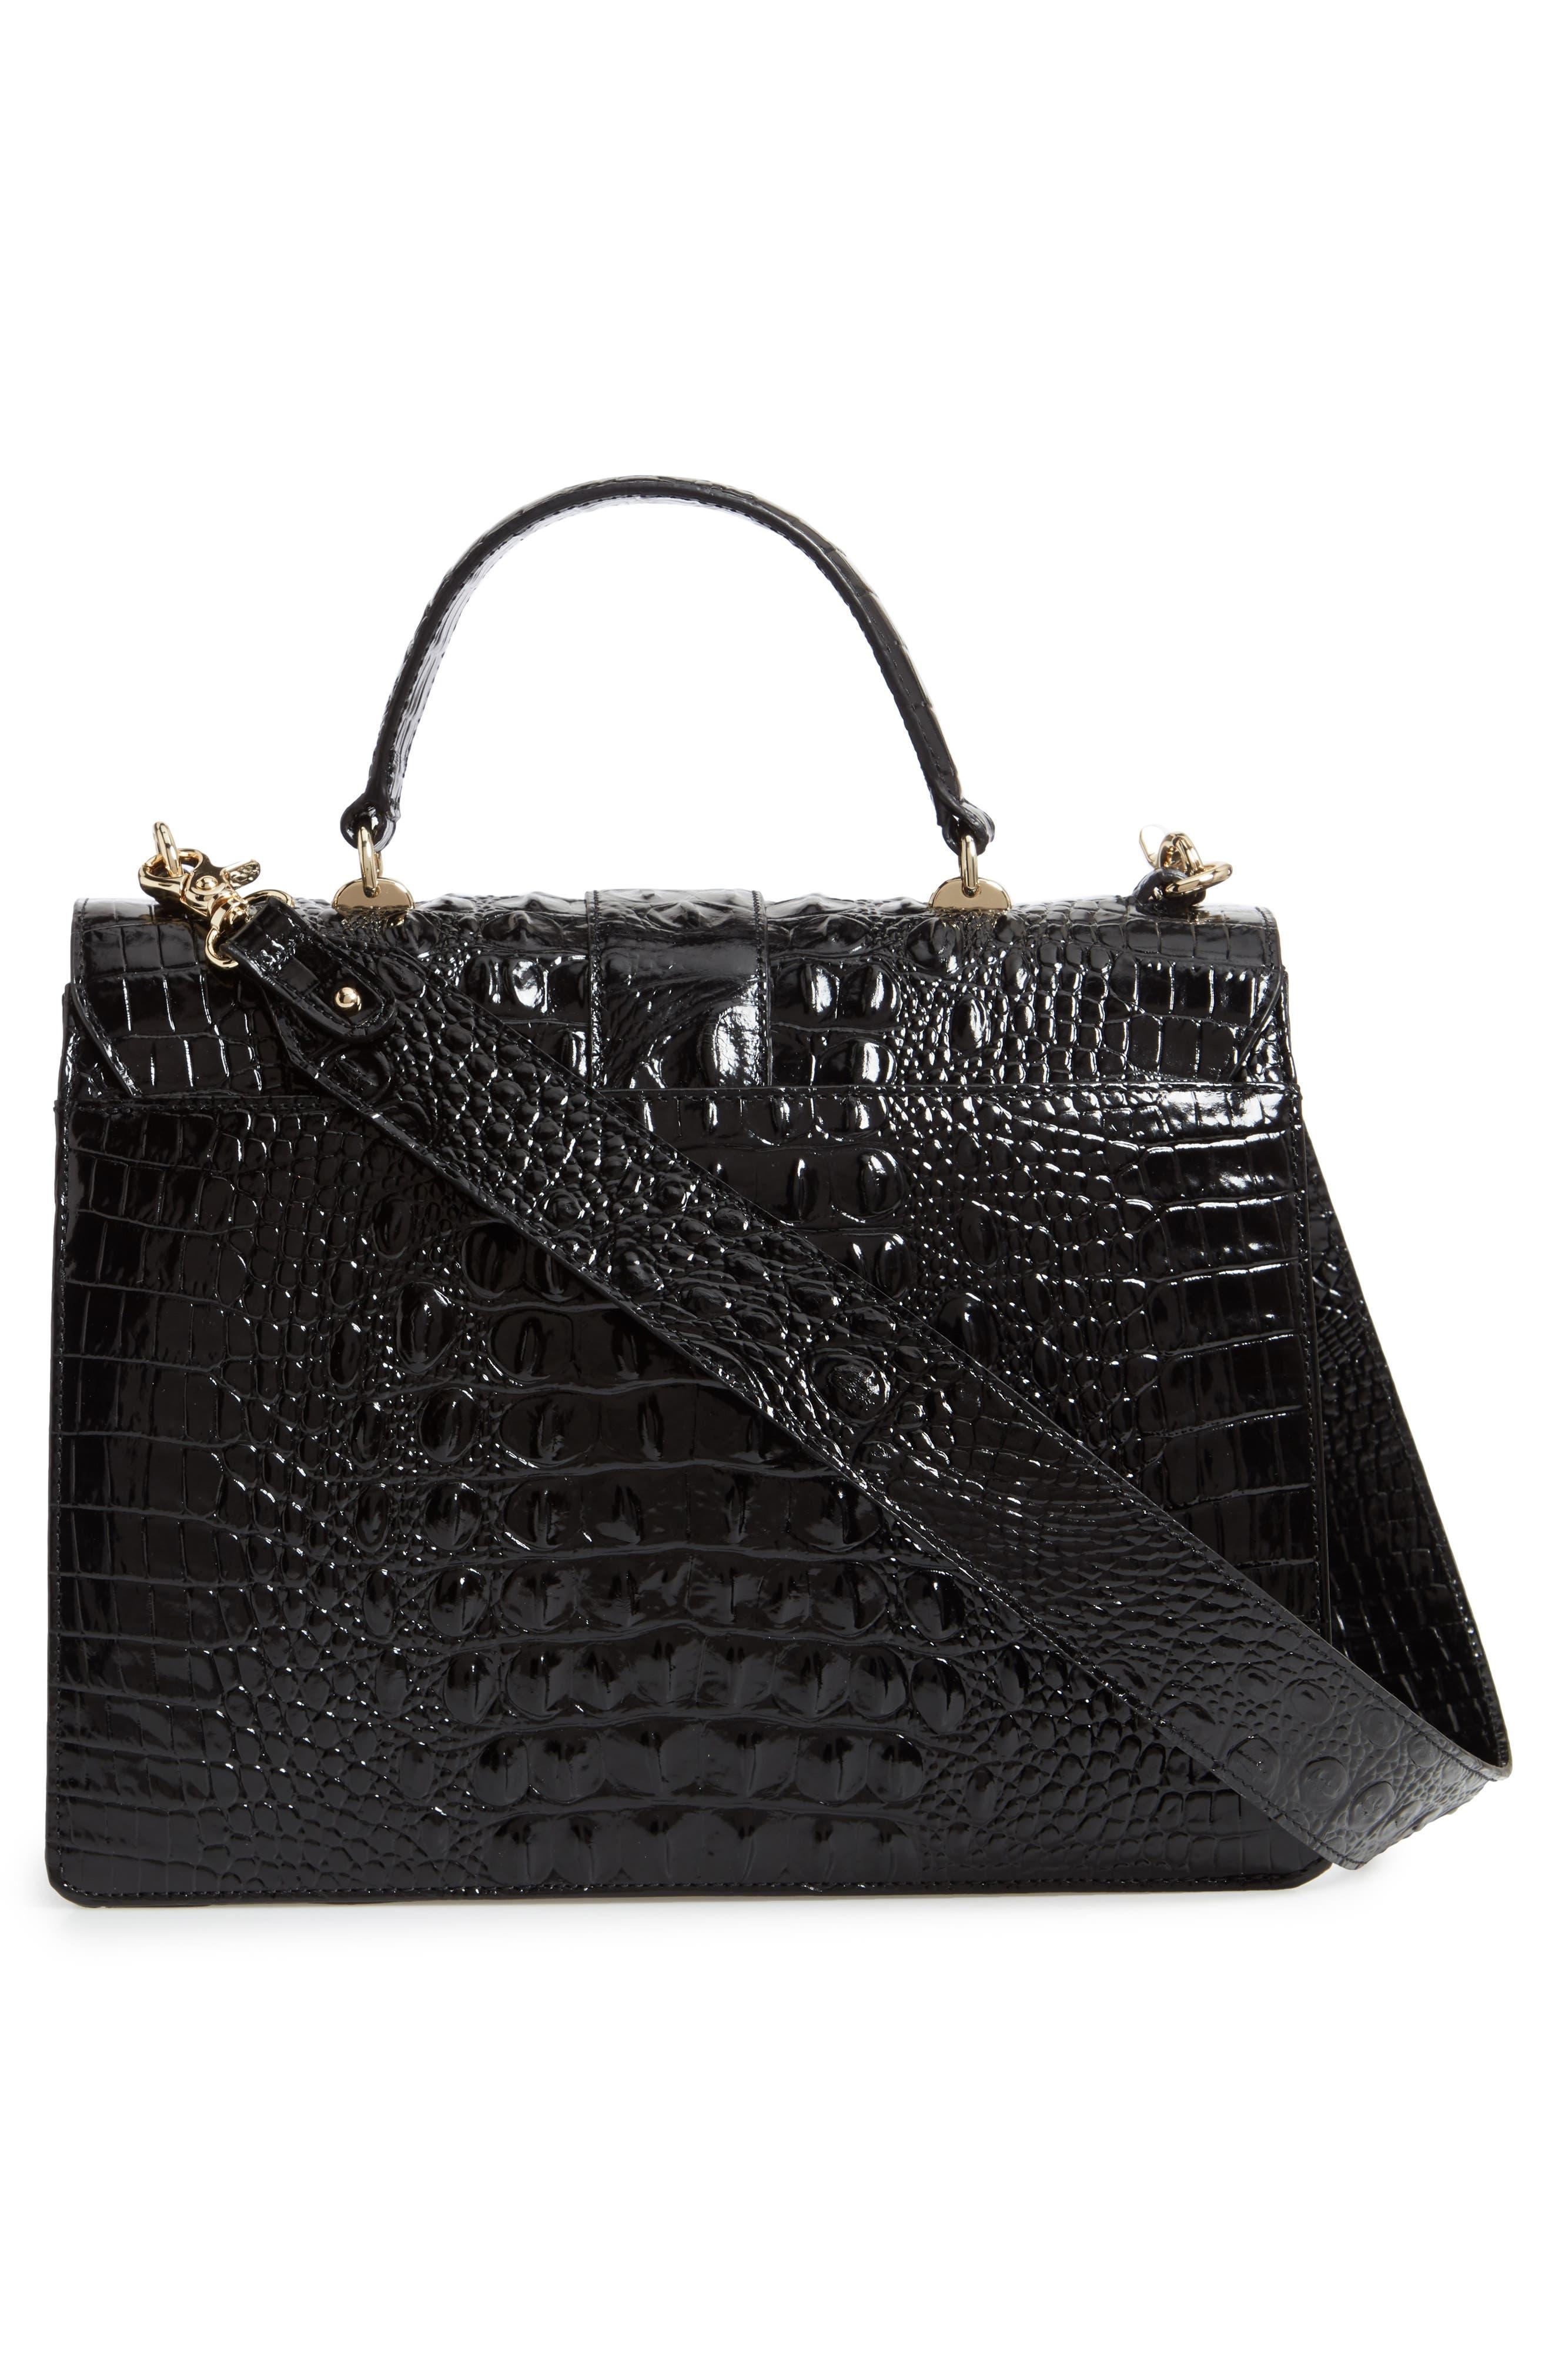 Medium Francine Croc Embossed Leather Satchel,                             Alternate thumbnail 3, color,                             BLACK